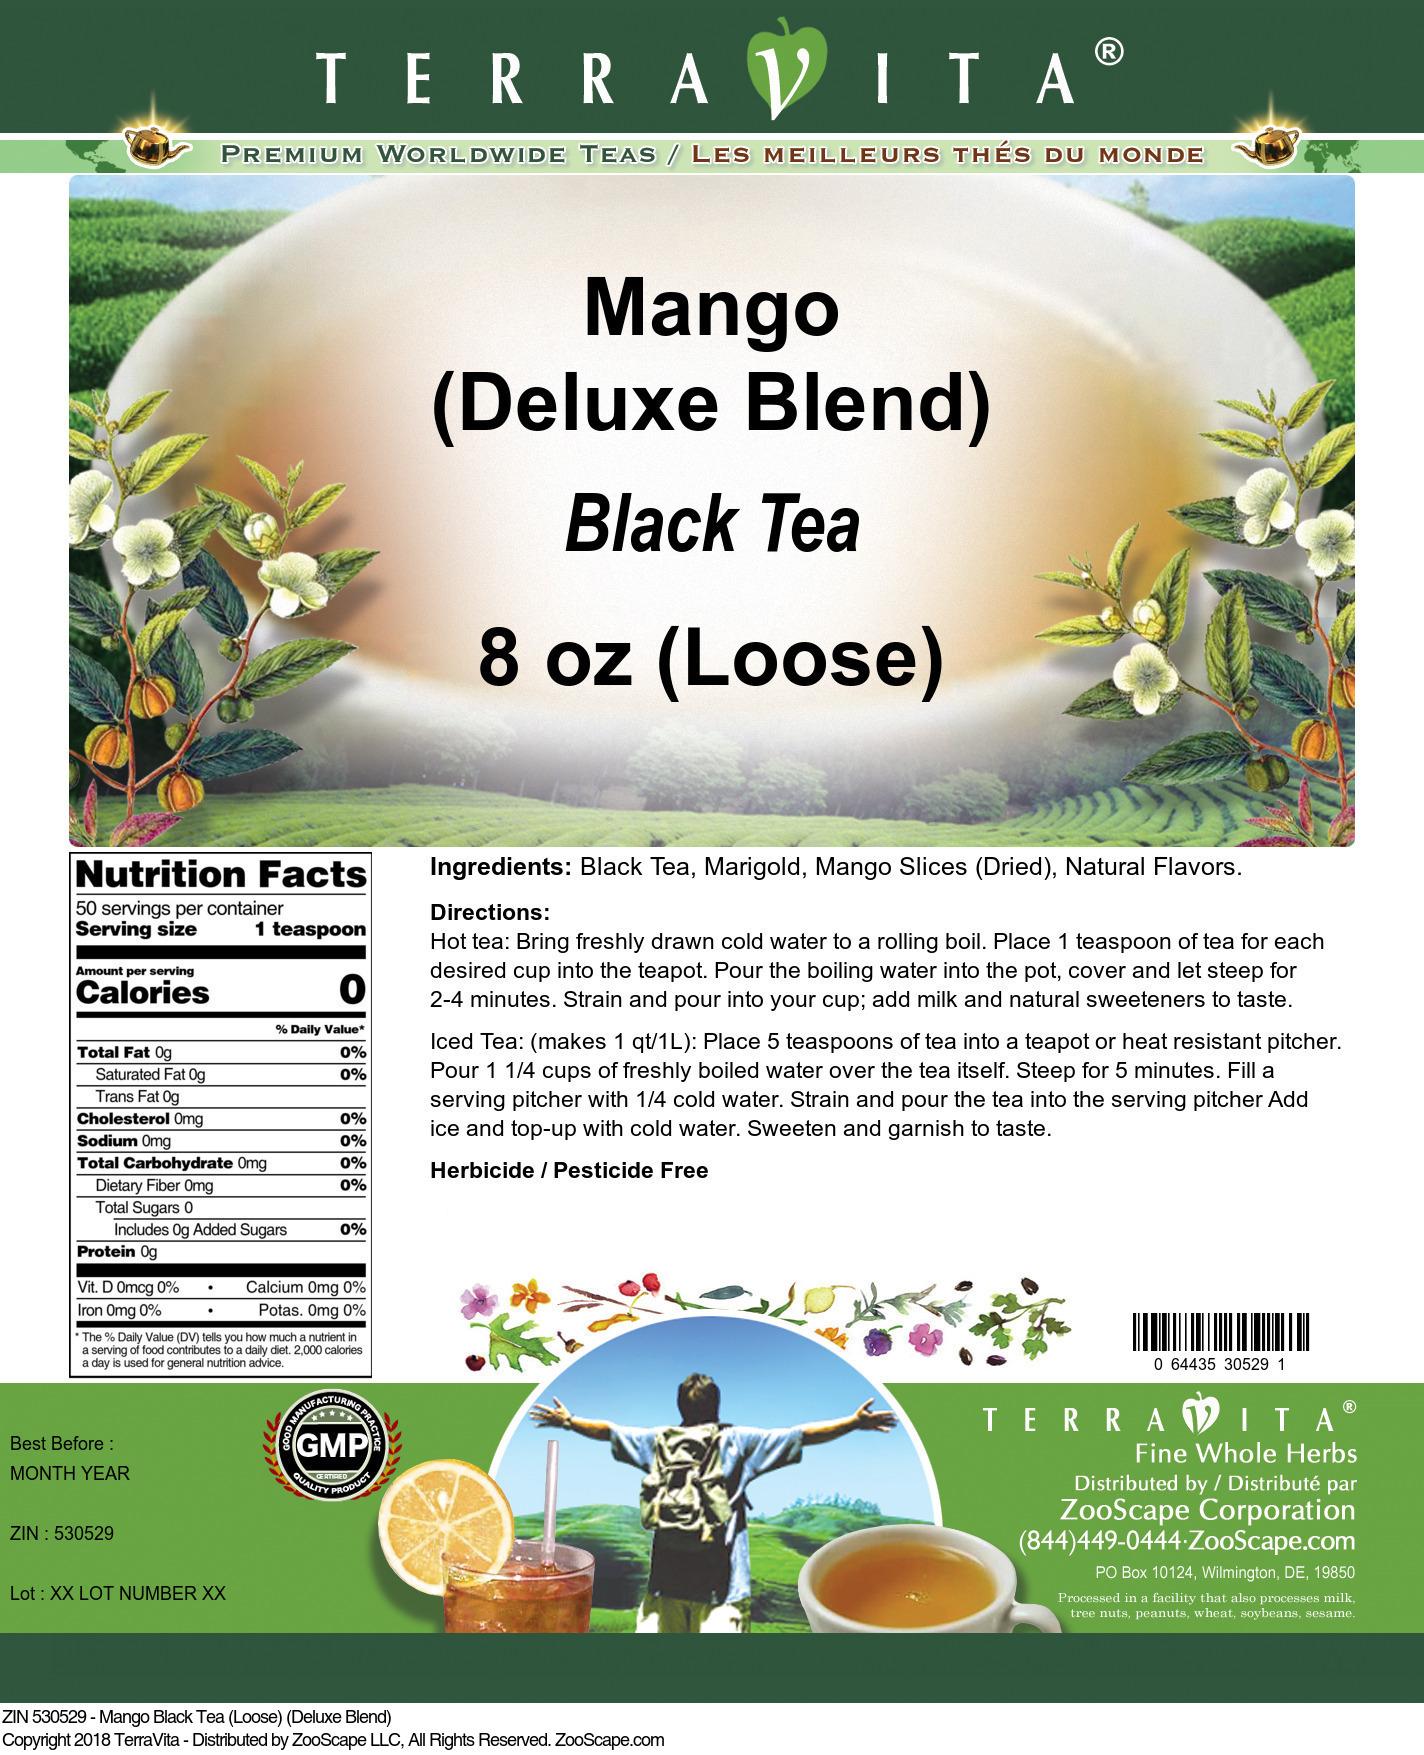 Mango Black Tea (Loose) (Deluxe Blend)